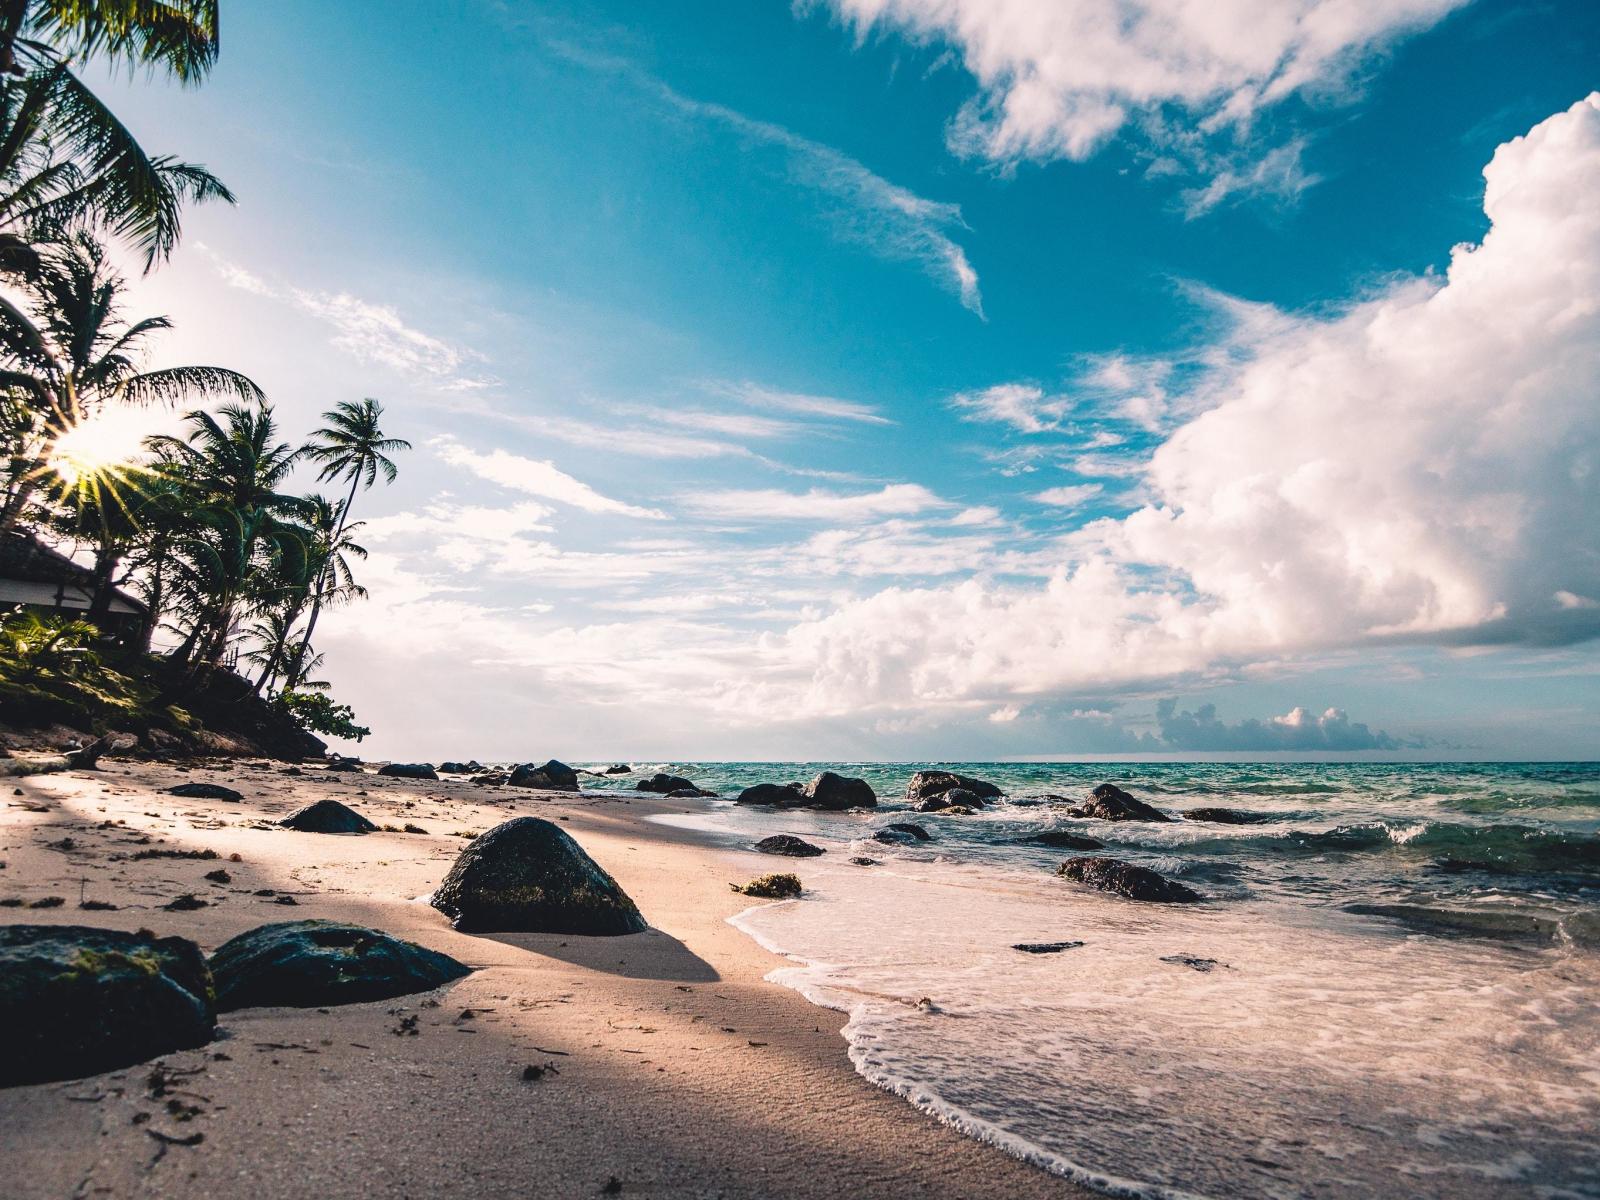 Download 1600x1200 Wallpaper Beach Rocks Sunny Day Nature